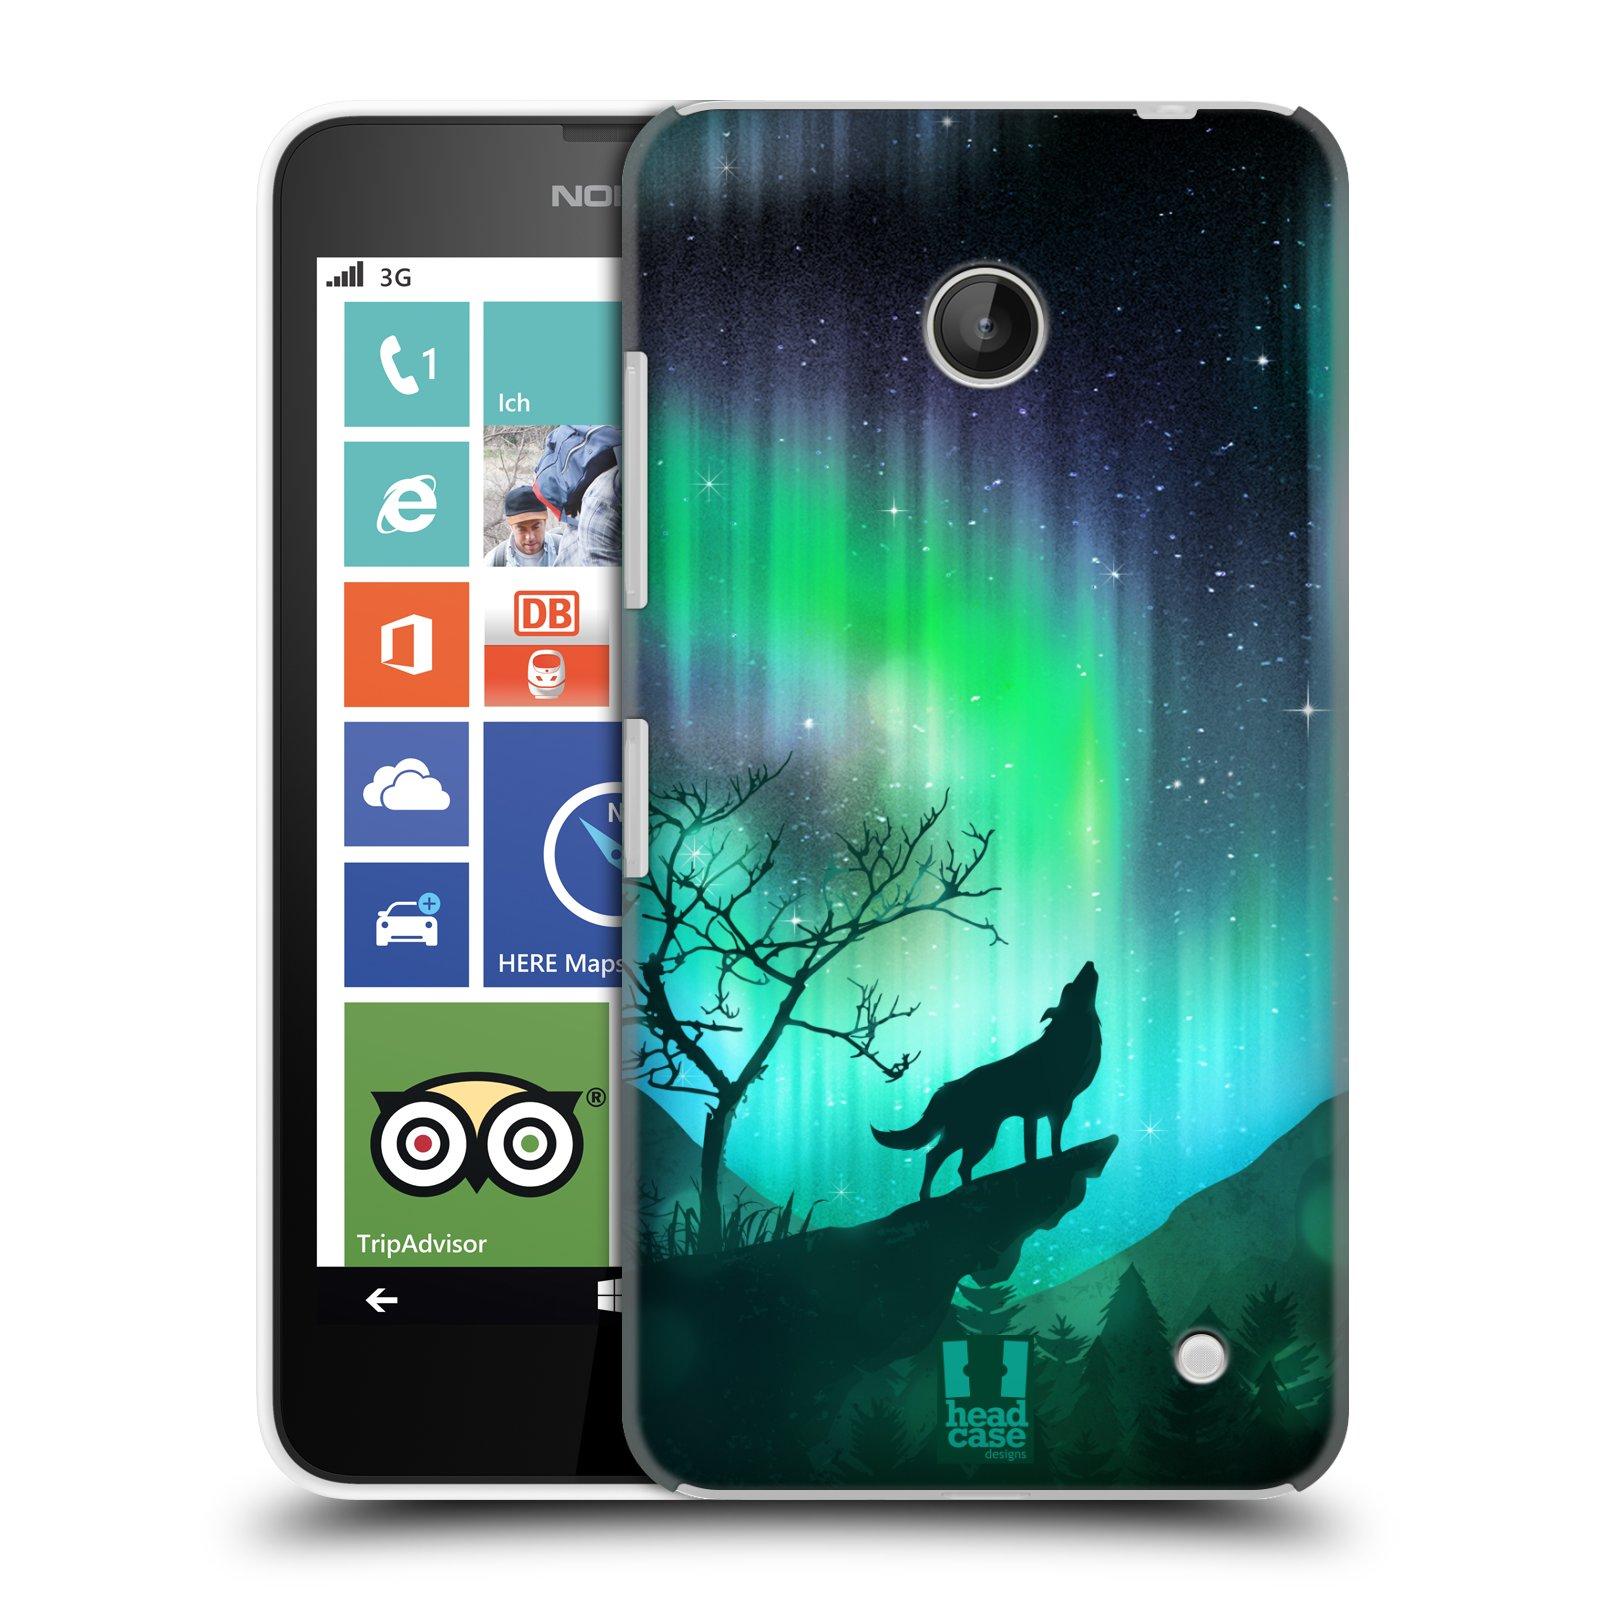 Plastové pouzdro na mobil Nokia Lumia 630 HEAD CASE Polární Záře Vlk (Kryt či obal na mobilní telefon Nokia Lumia 630 a Nokia Lumia 630 Dual SIM)